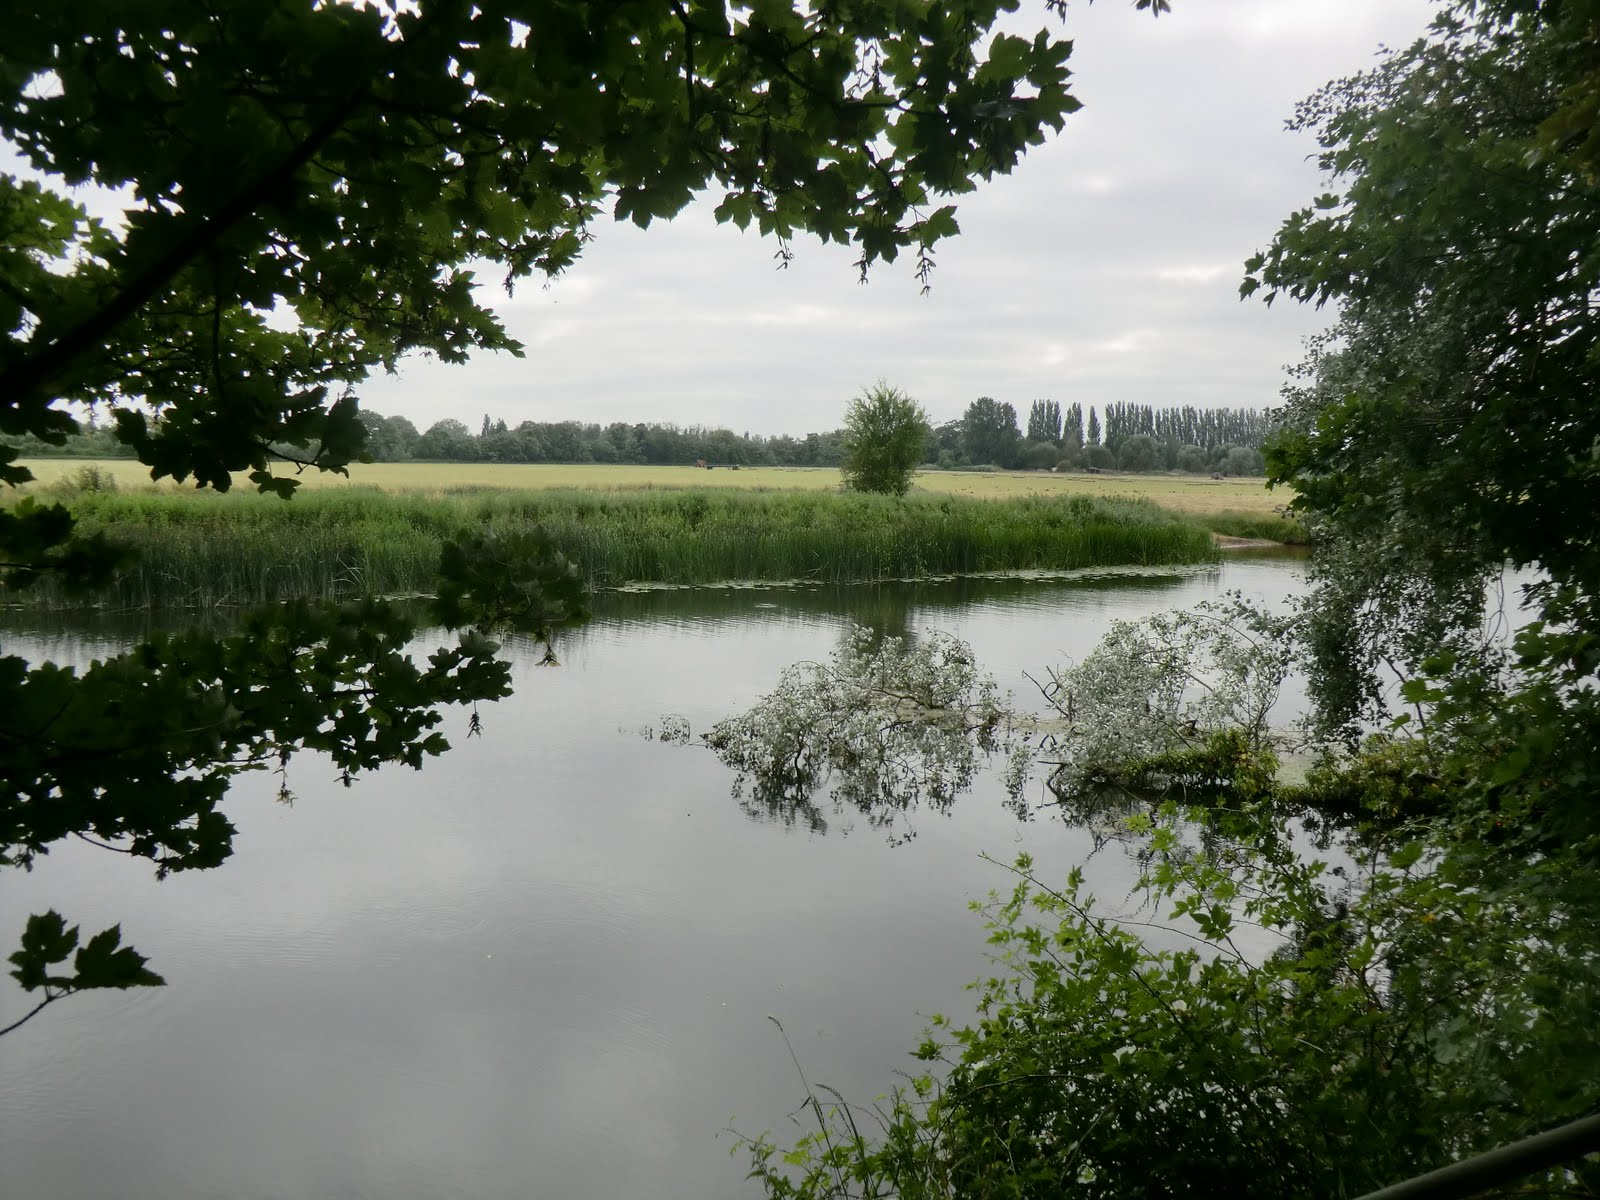 CIMG7885 Hemingford Grey Meadow across the river